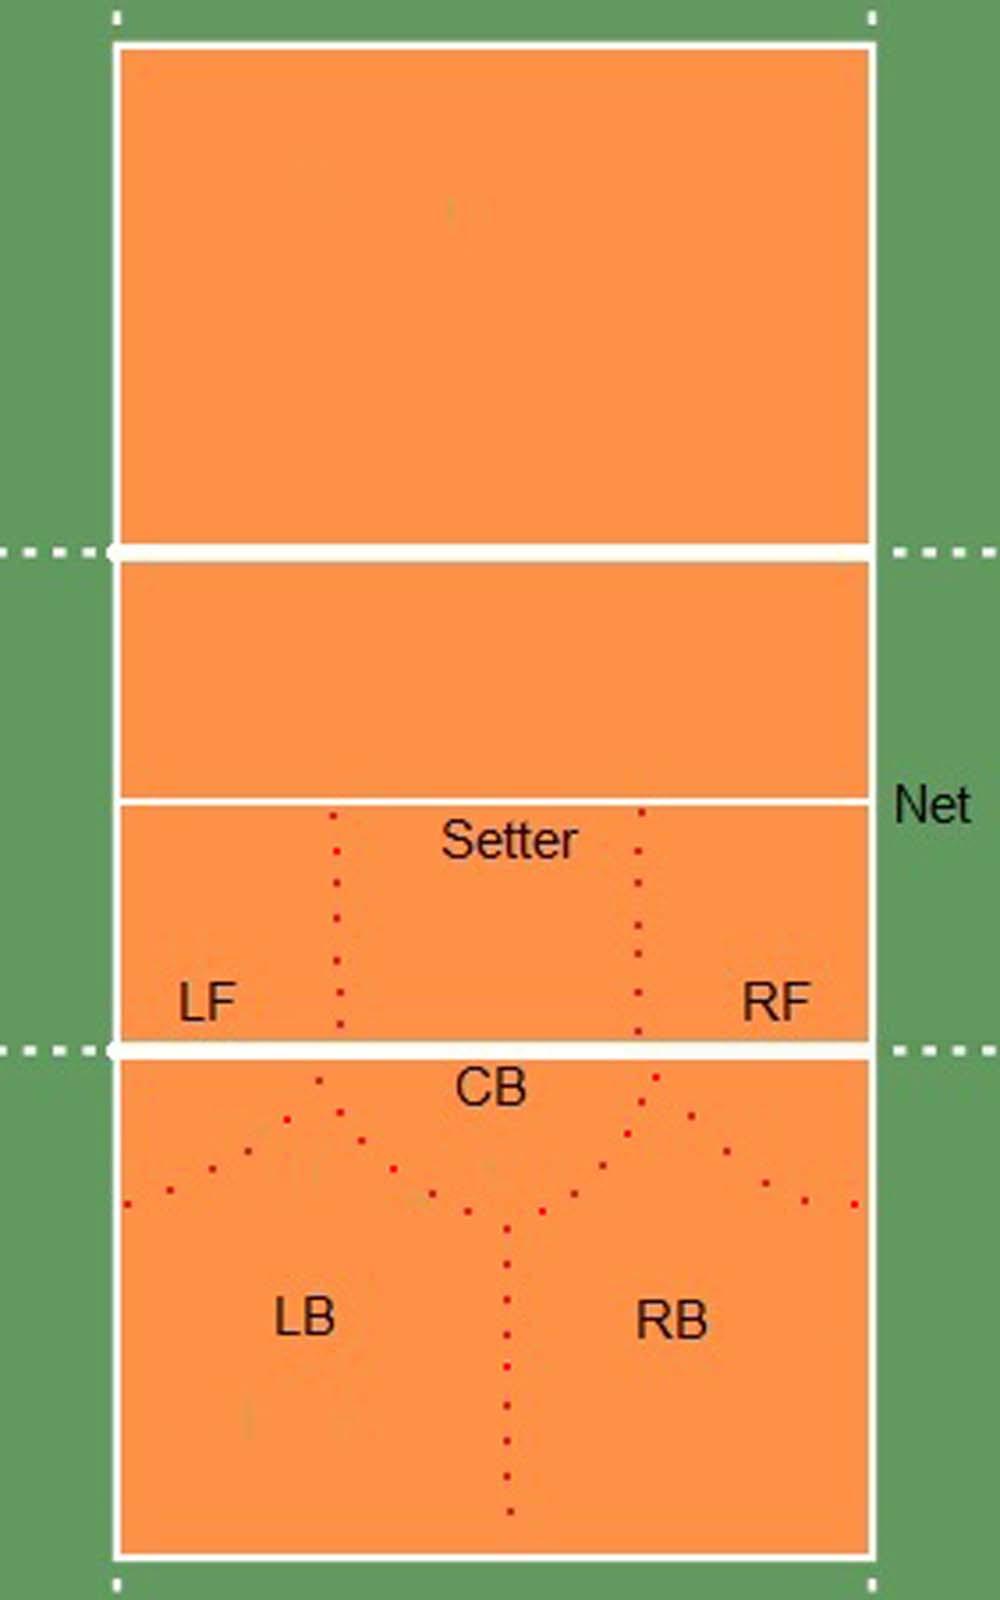 Formasi Dalam Permainan Bola Voli : formasi, dalam, permainan, Teknik, Menyerang, Sederhana, Dengan, Pemain, Depan